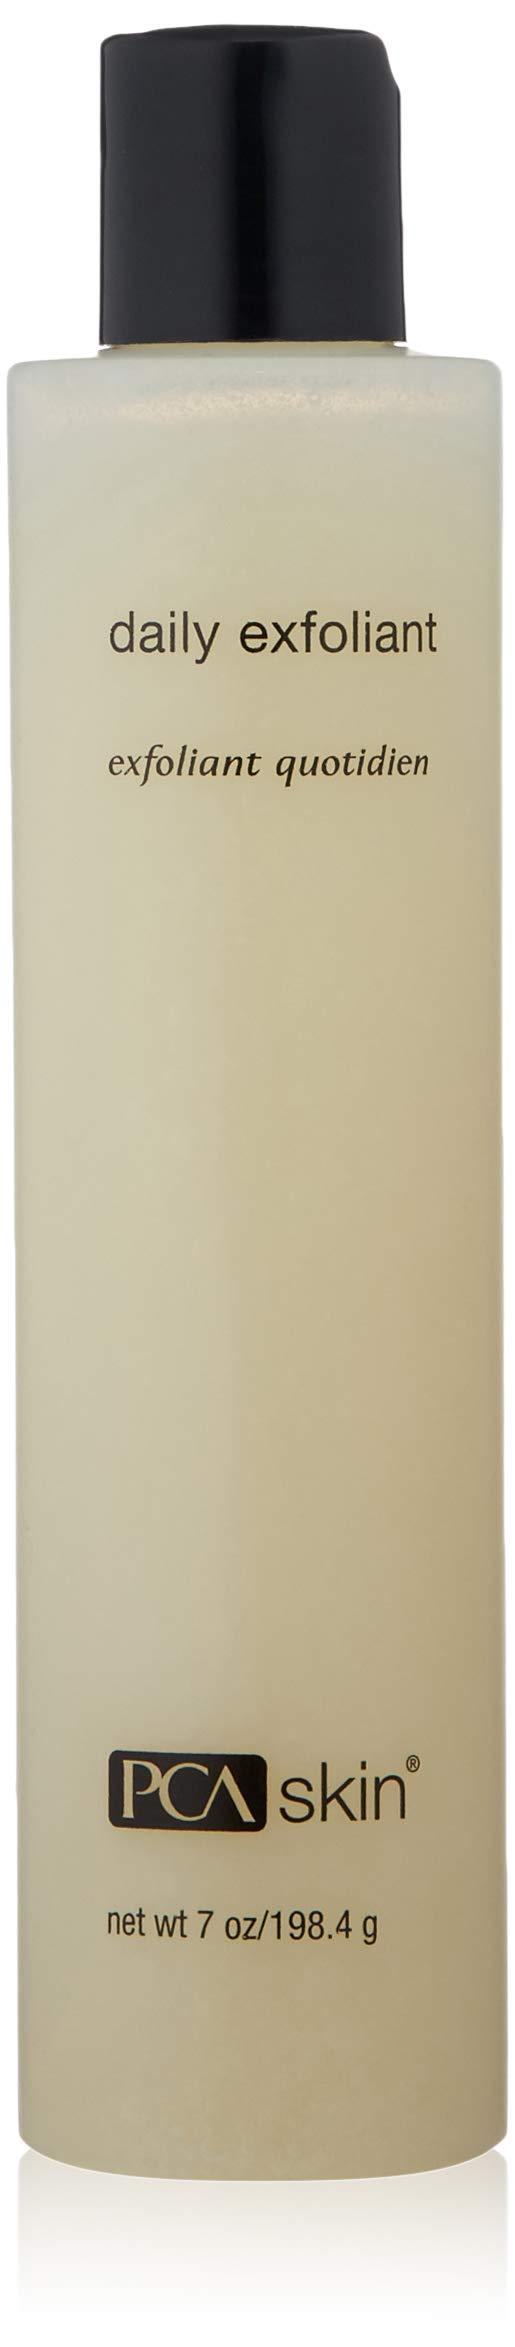 PCA SKIN Daily Exfoliant, Moisturizing Skin Smoothing Cleanser, 7 fl. oz.